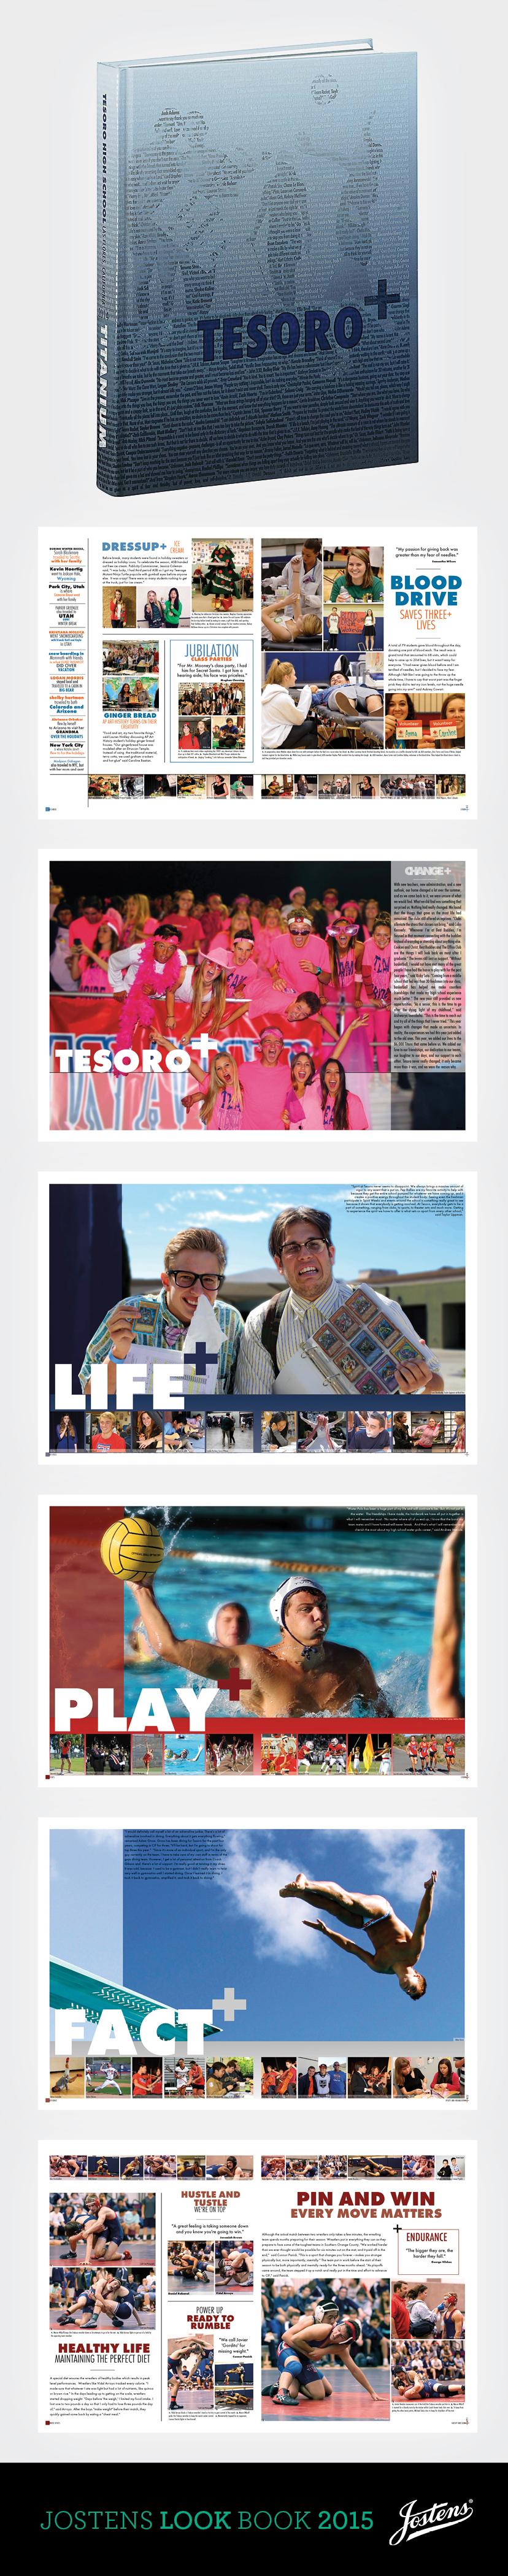 Titanium Tesoro High School Las Flores Ca Jostens Lookbook2015 Ybklove Yearbook Covers Themes Yearbook Covers Yearbook Layouts